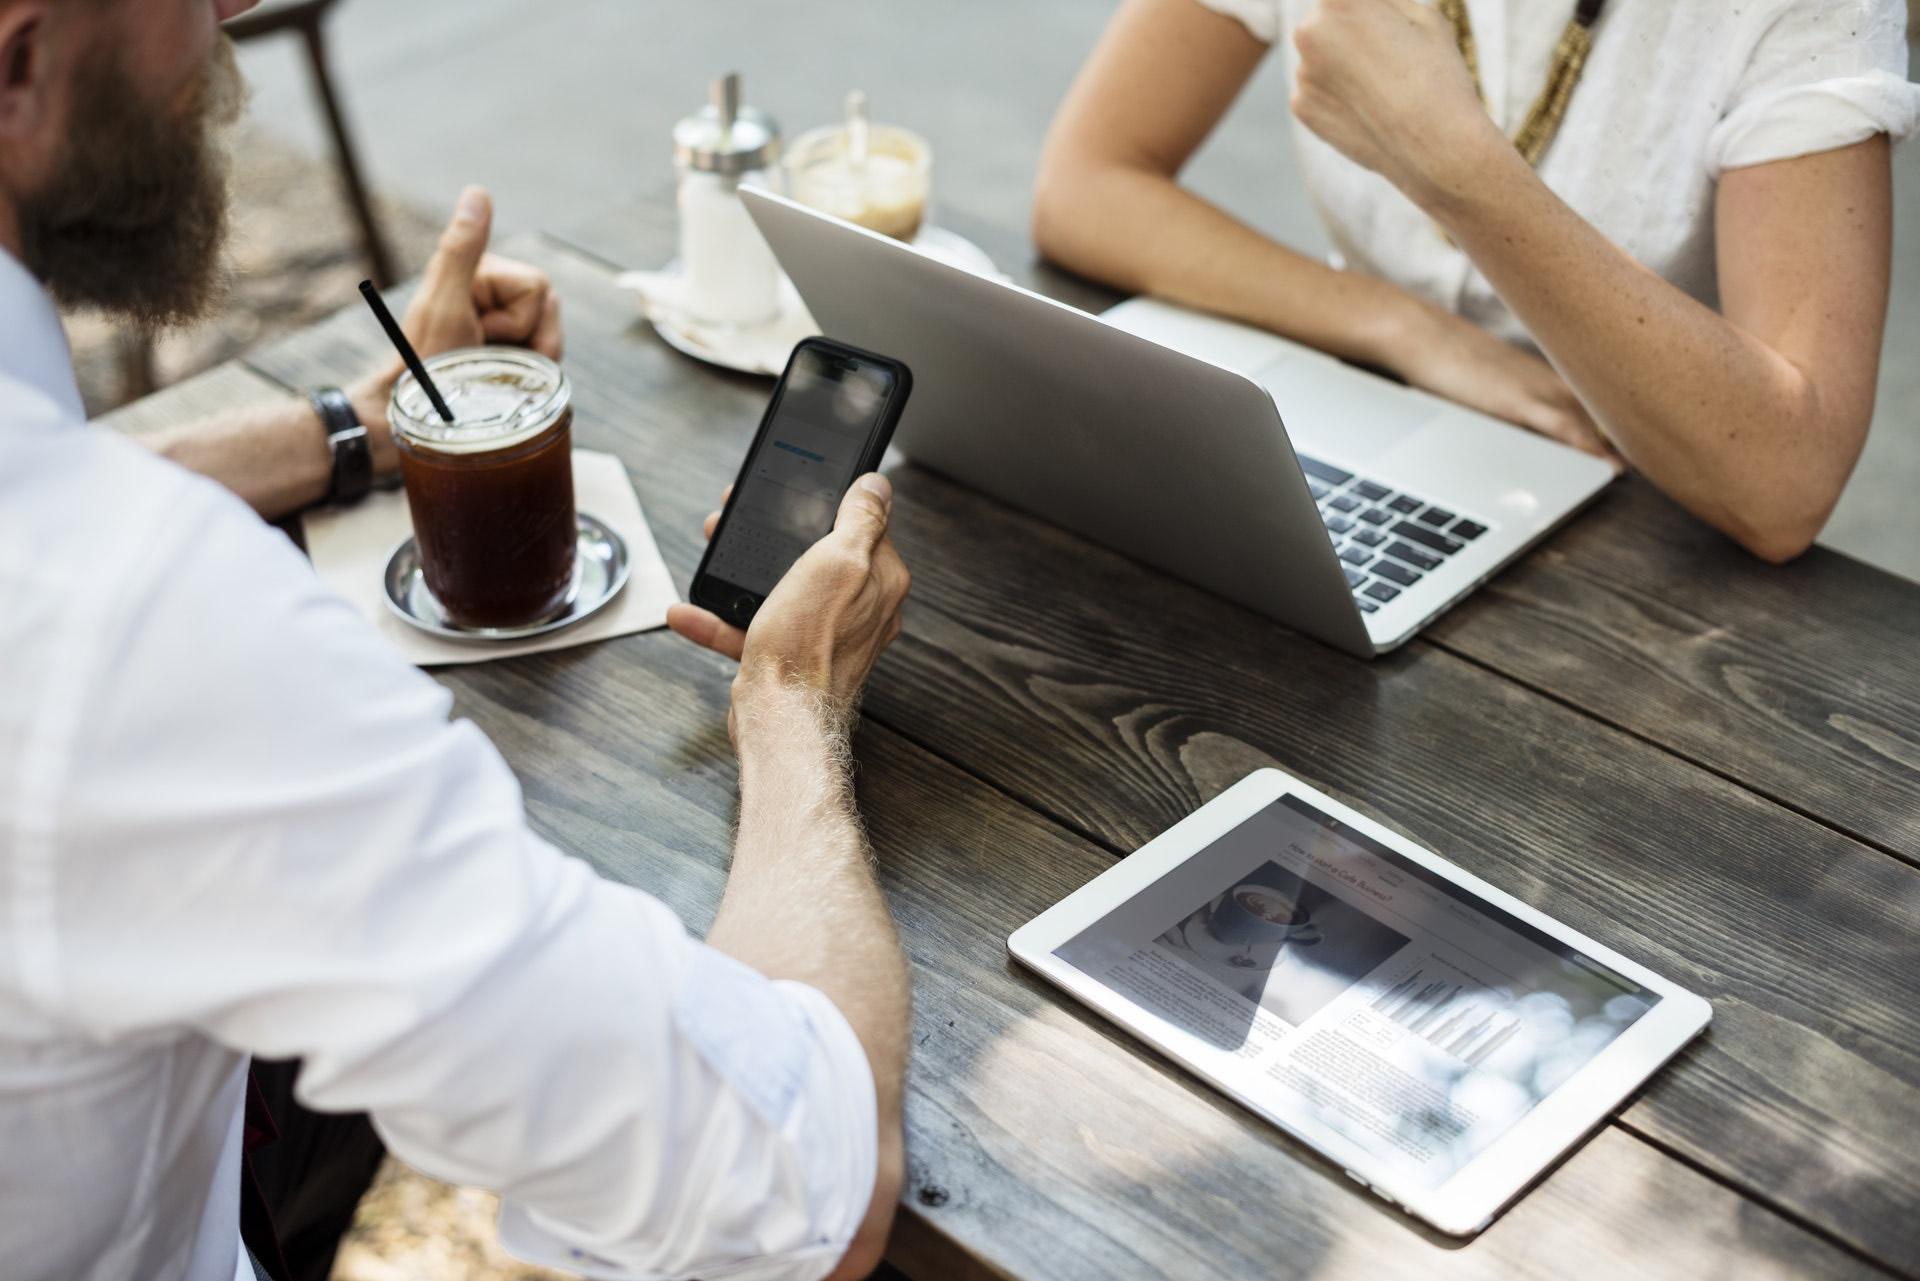 Make money online: 5 Easy ways to get started as a Beginner?